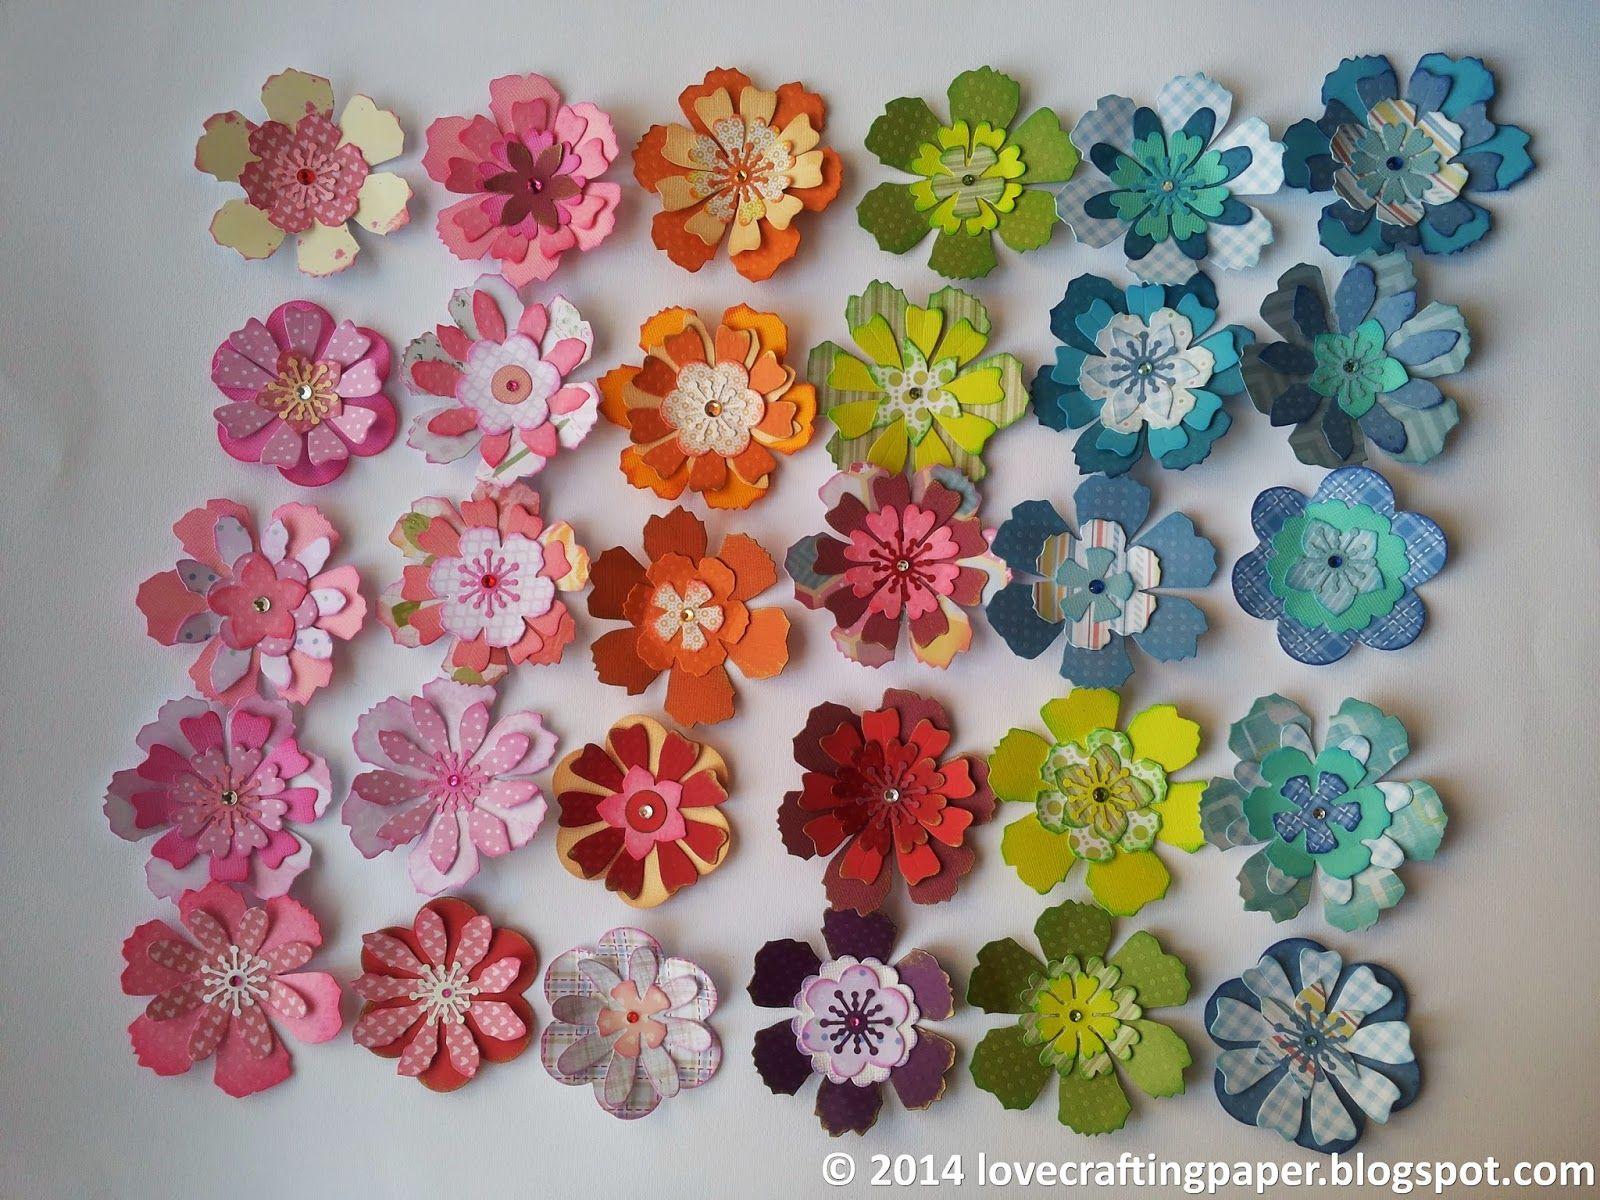 lovecraftingpaper: Flower power 3